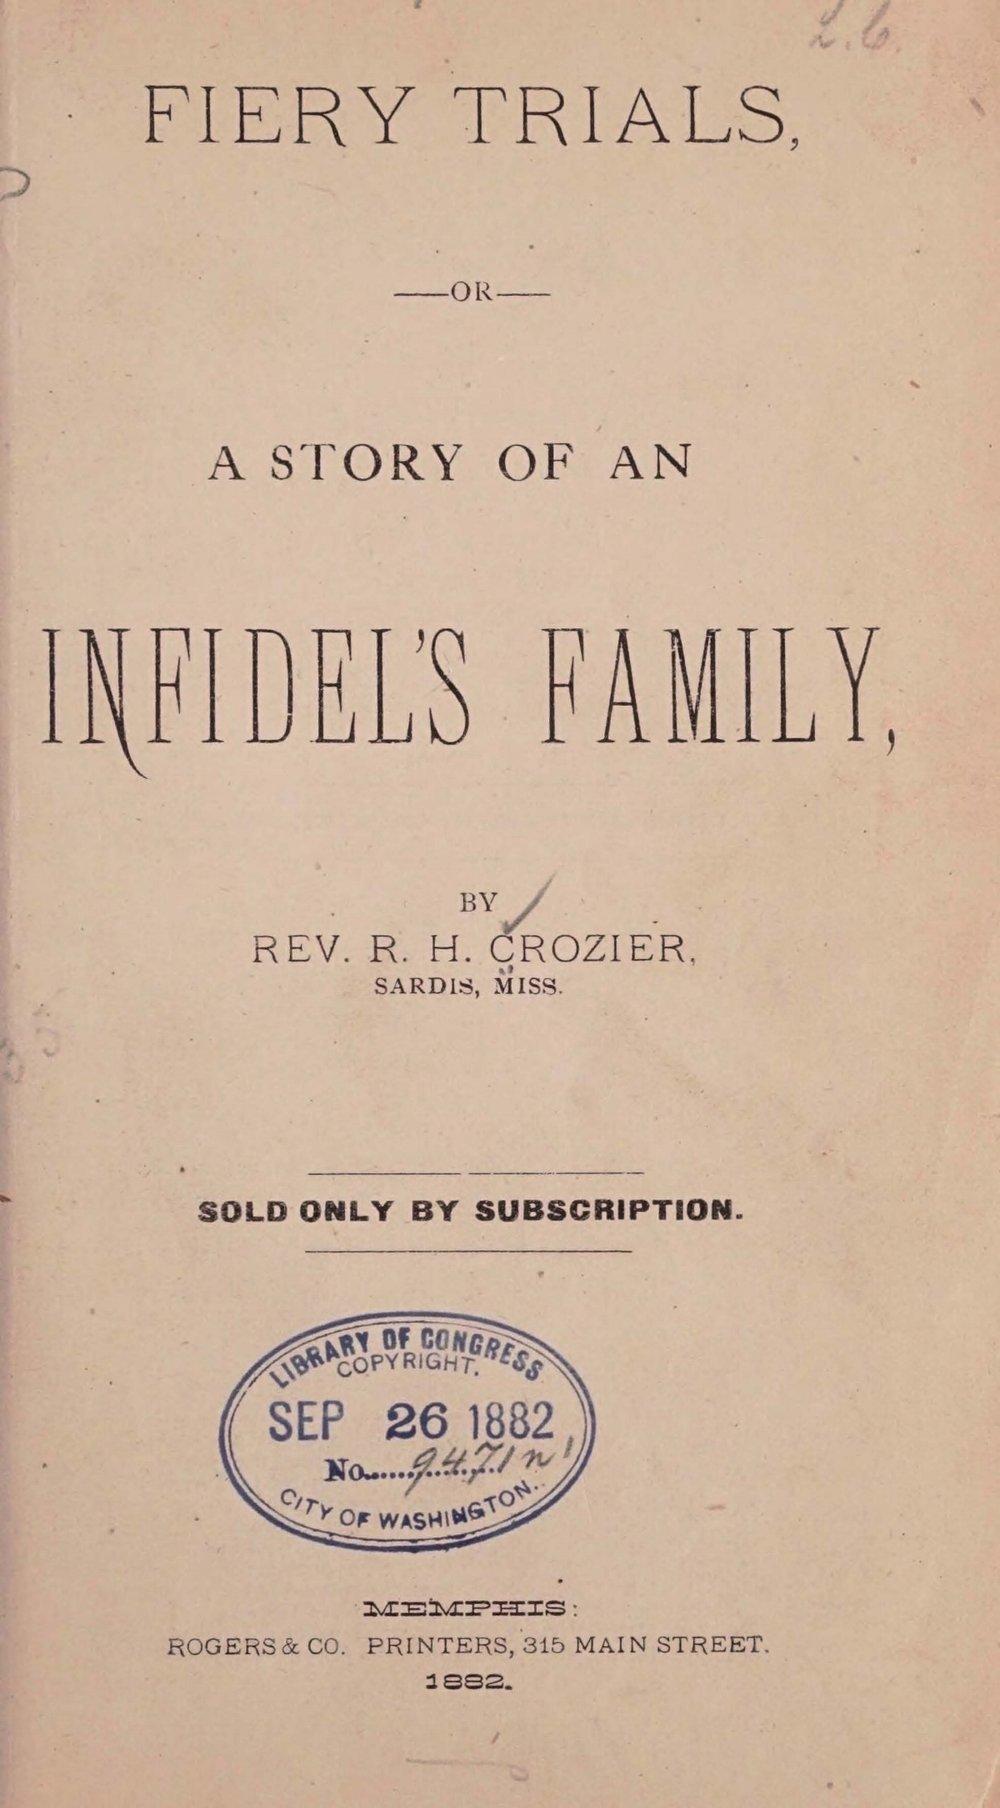 Crozier, Robert Hoskins, Fiery Trials Title Page.jpg